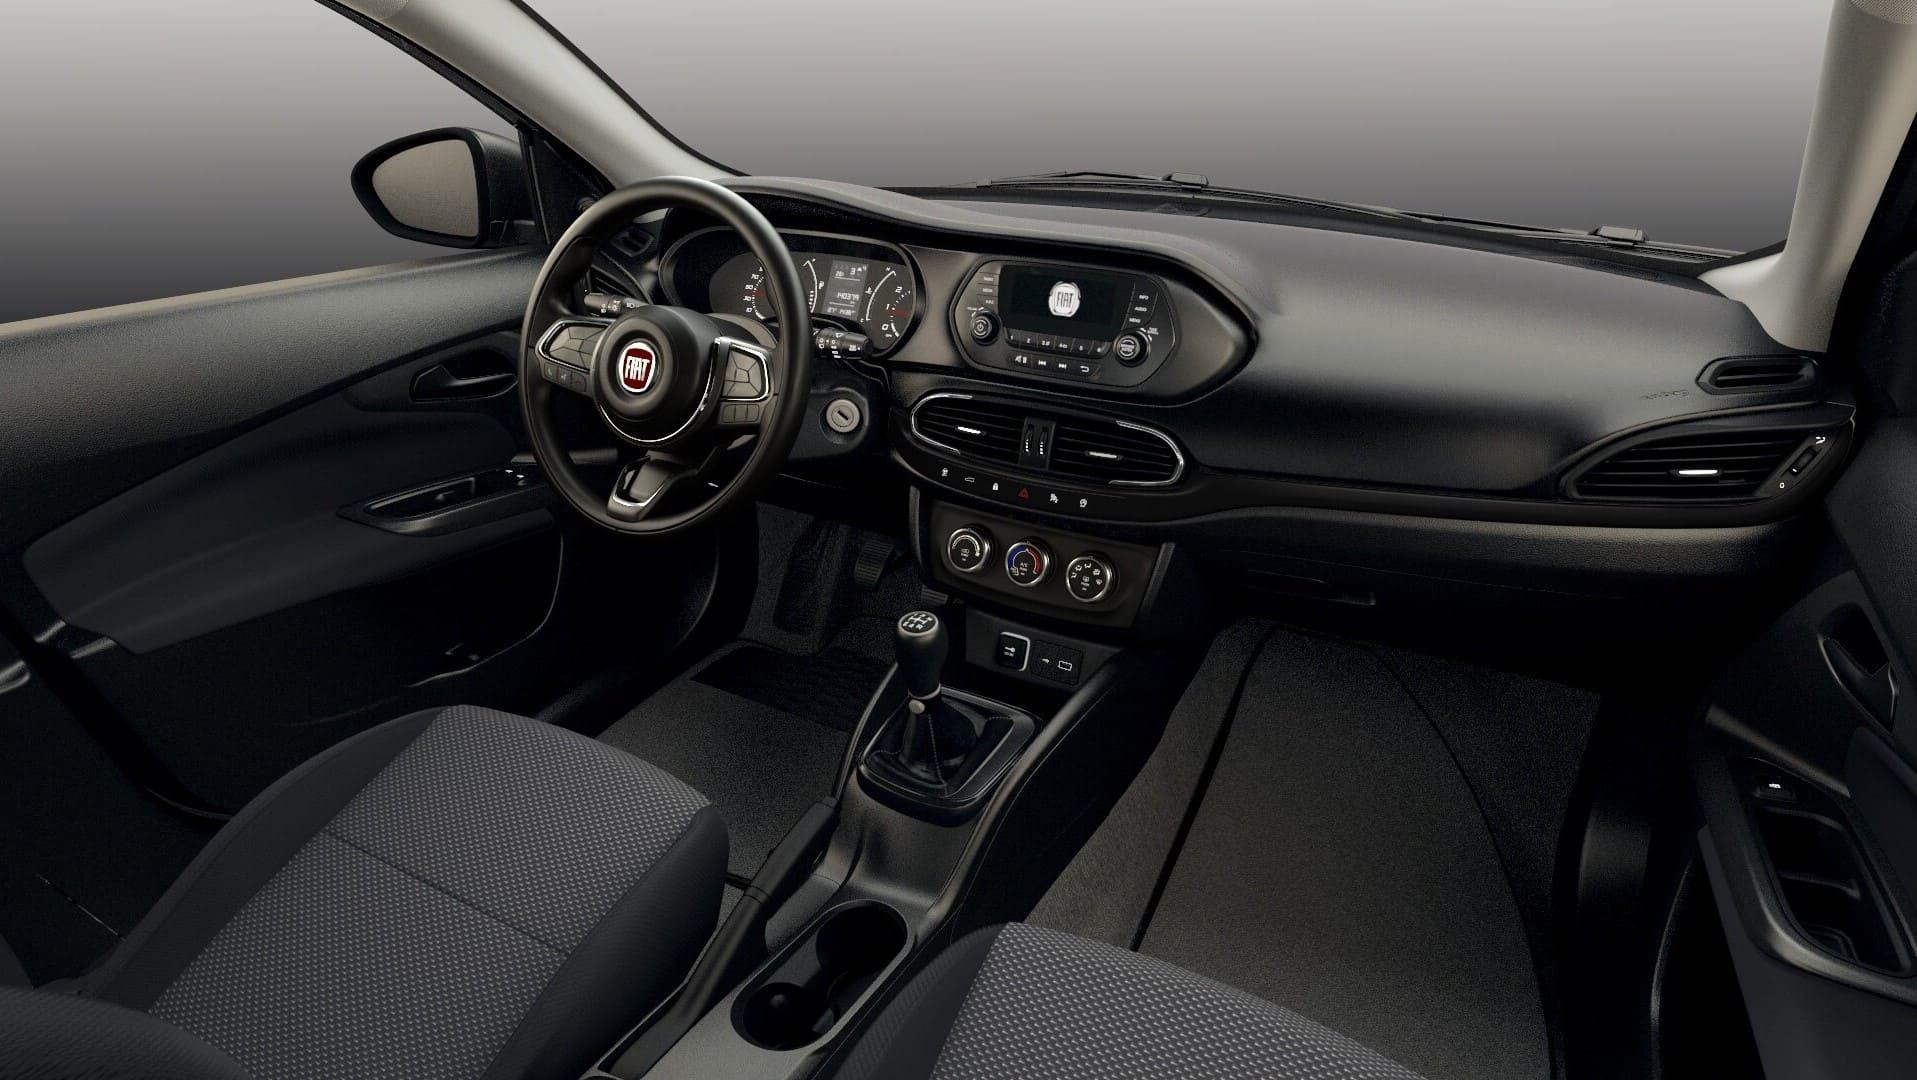 renting Fiat TipoSW 1.3 Mjet